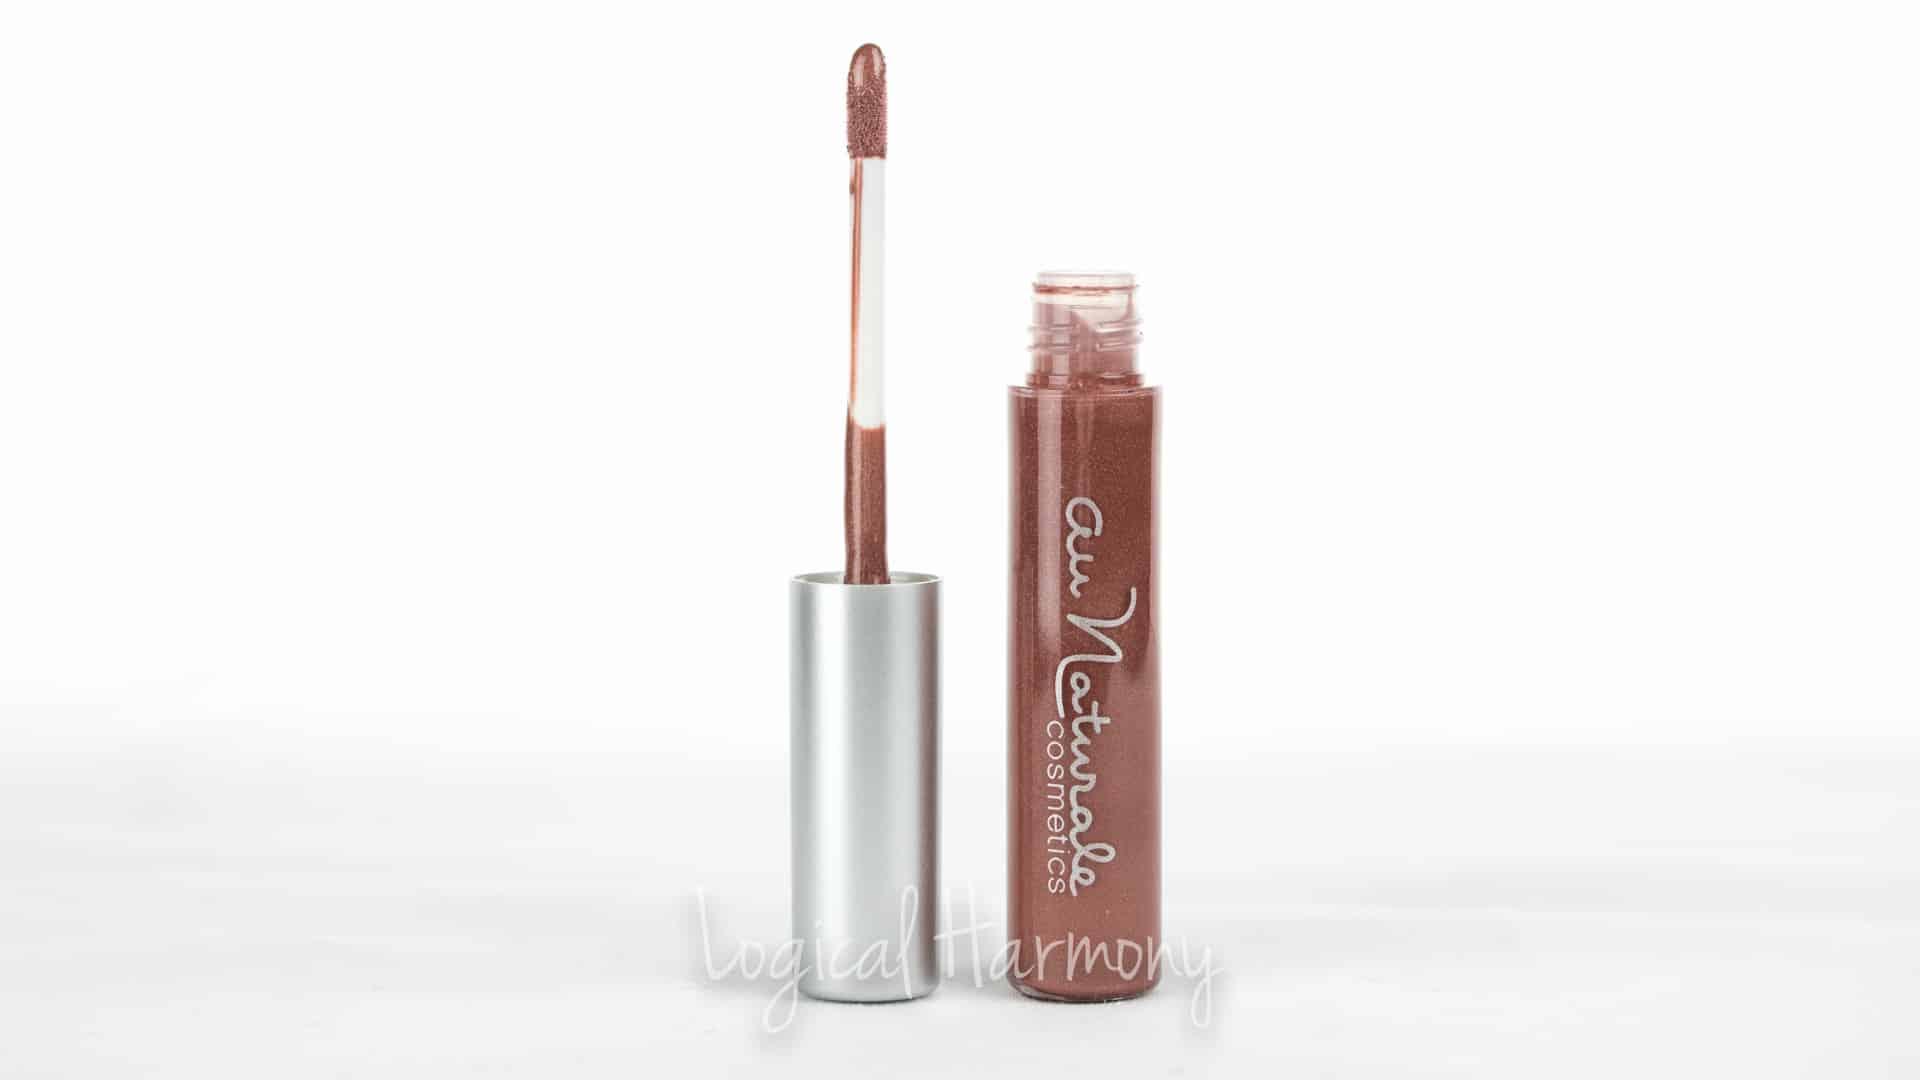 Au Naturale Lip Gloss in Nudist Review